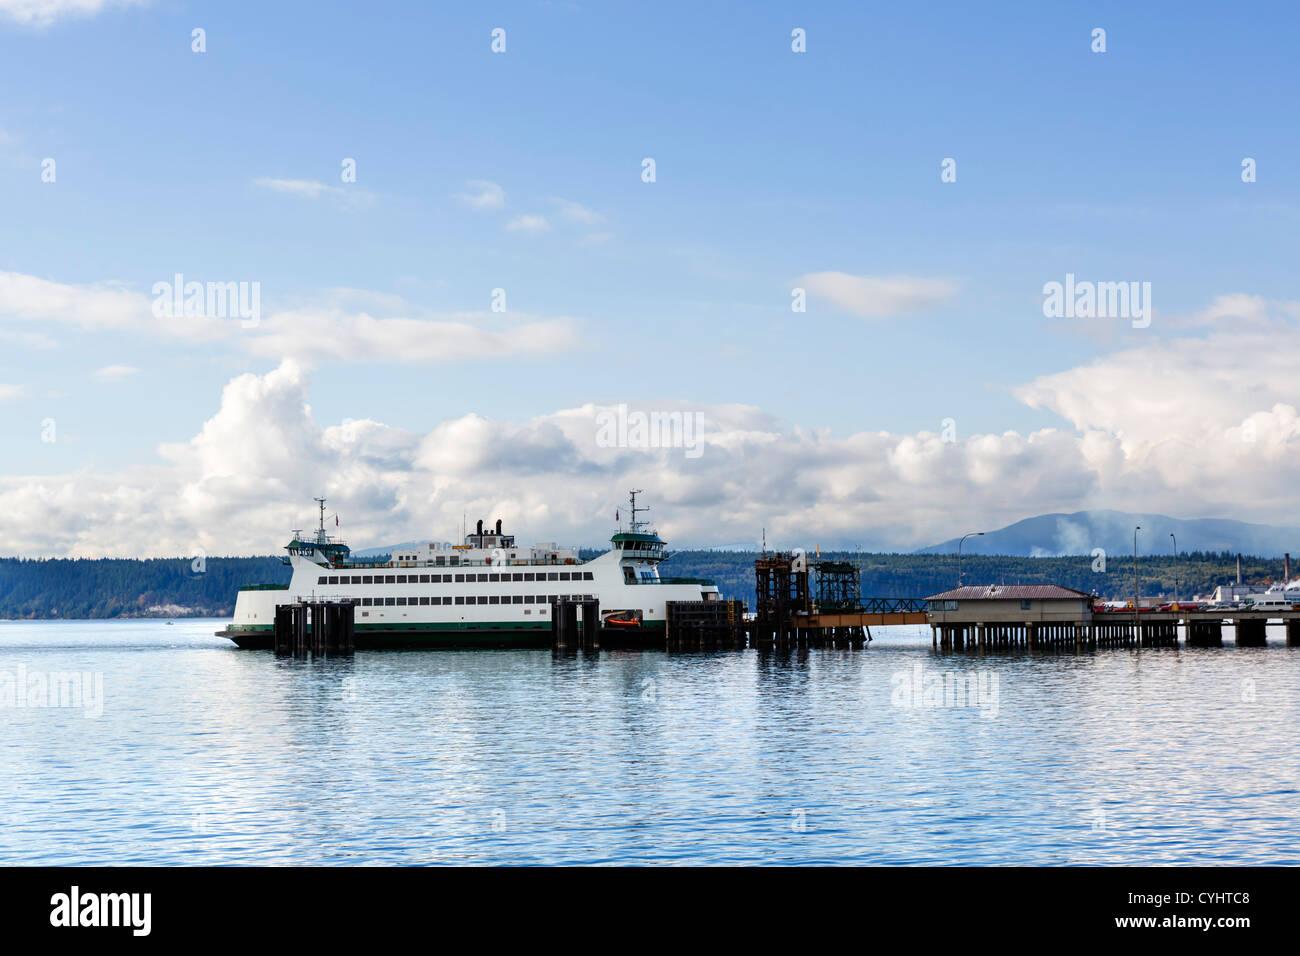 Washington State Ferries ferry at Port Townsend, Olympic Peninsula, Washington, USA - Stock Image